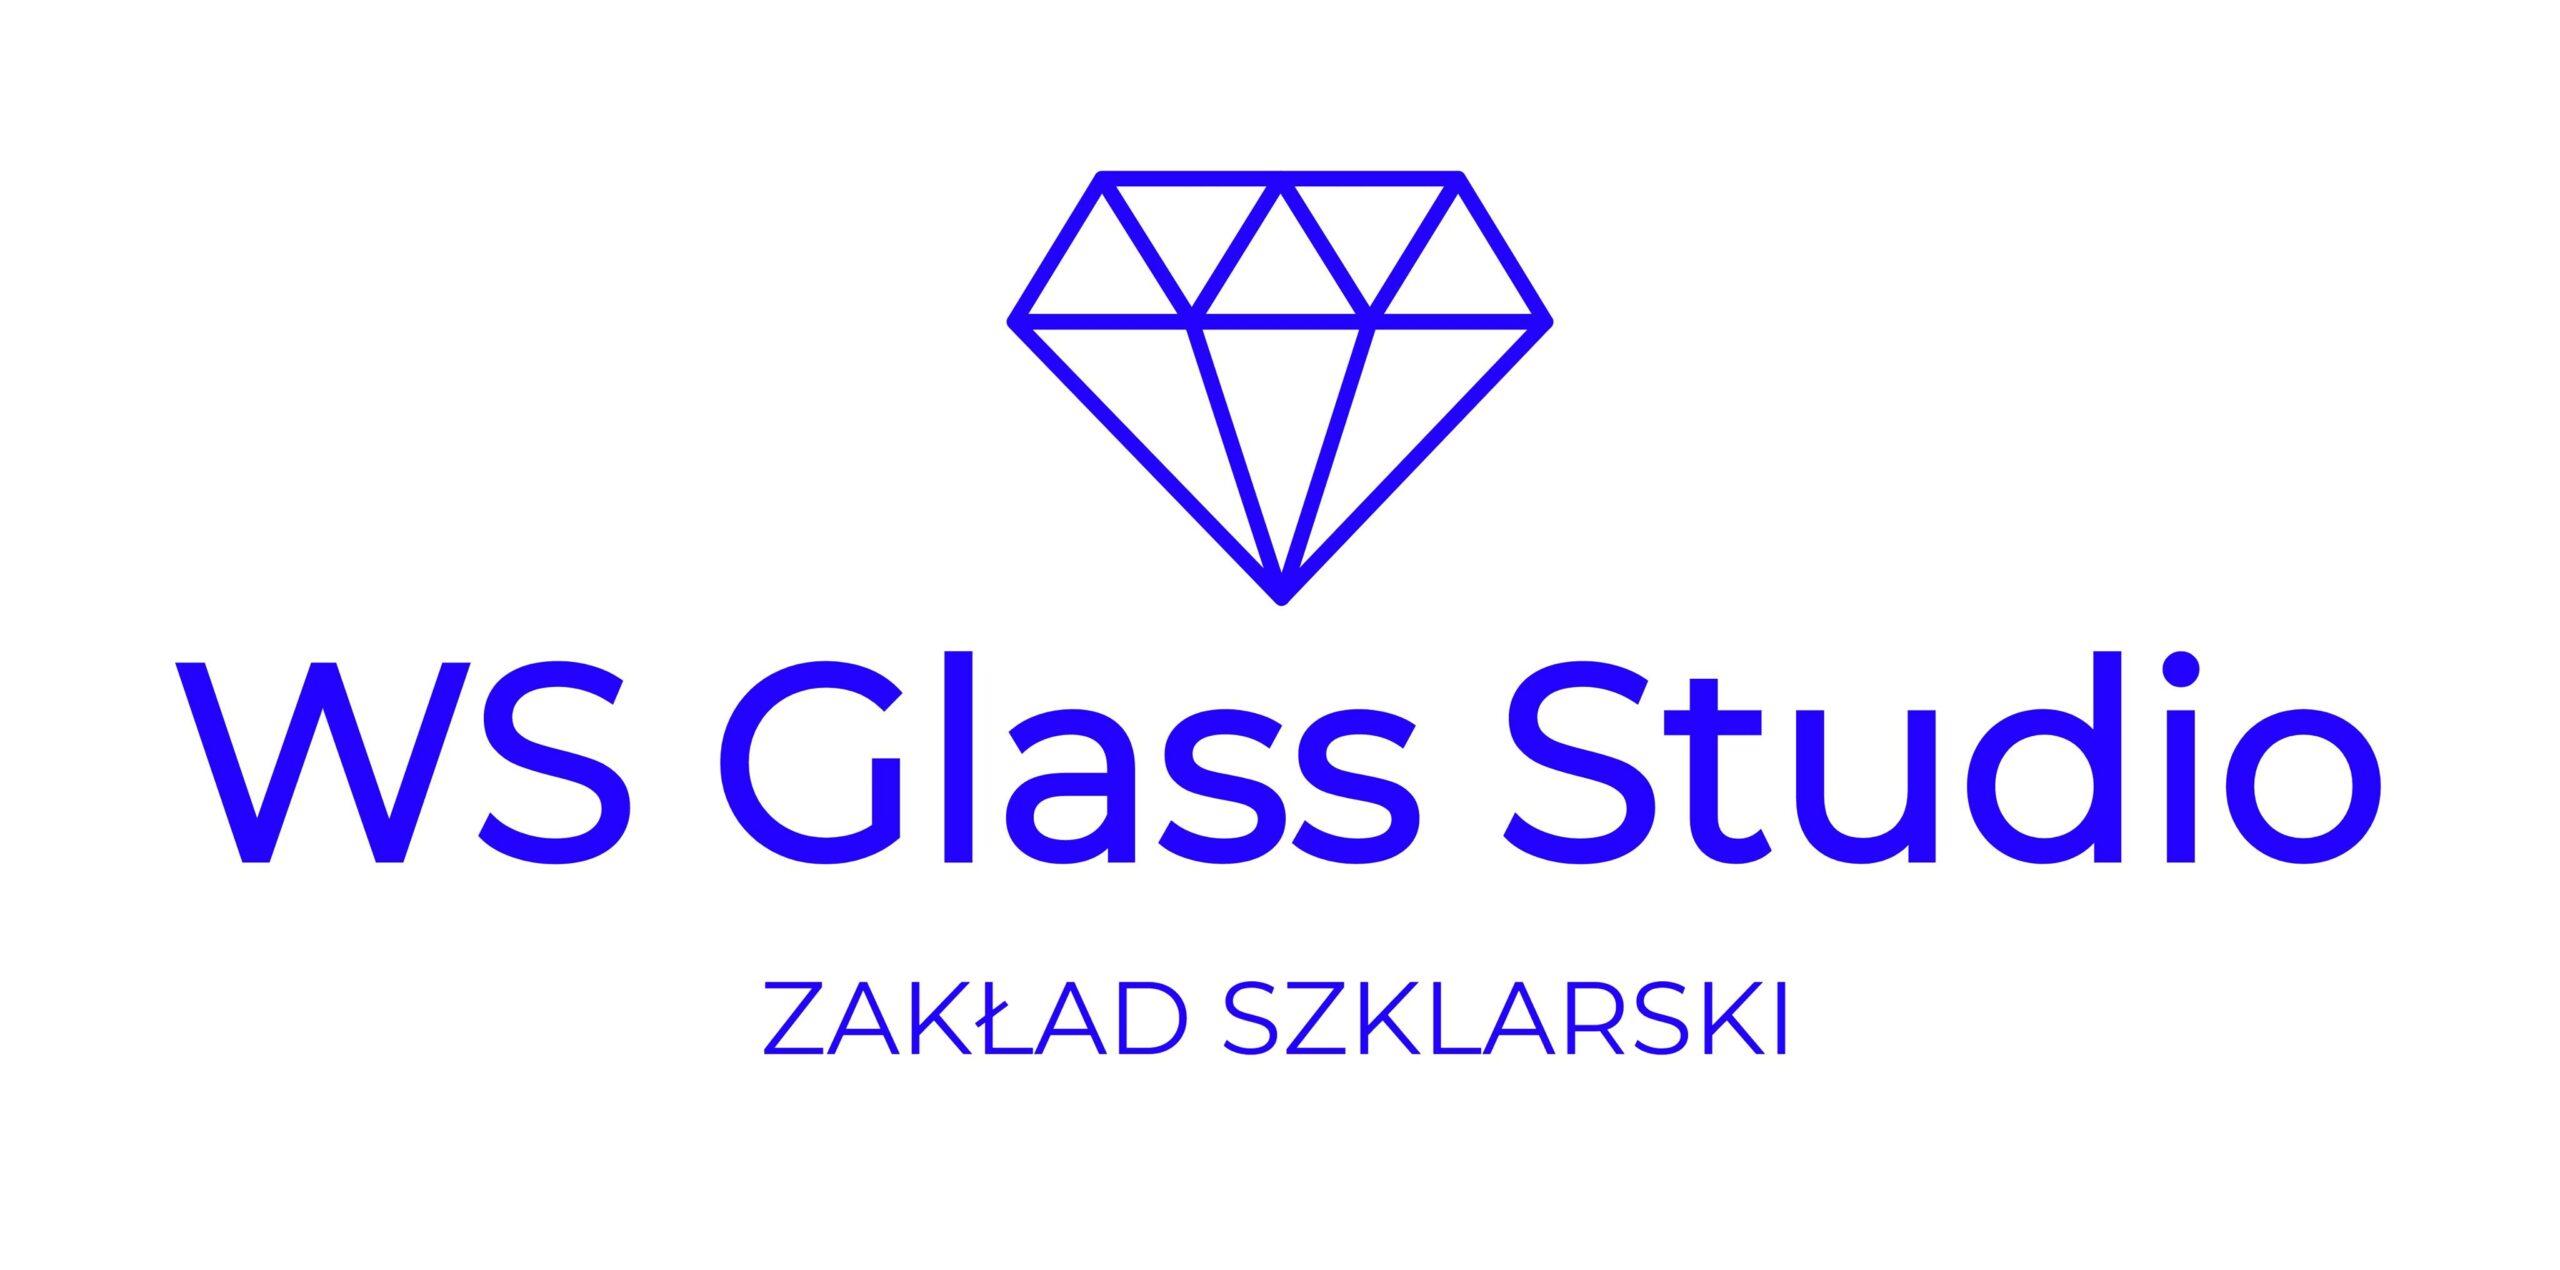 WS Glass Studio